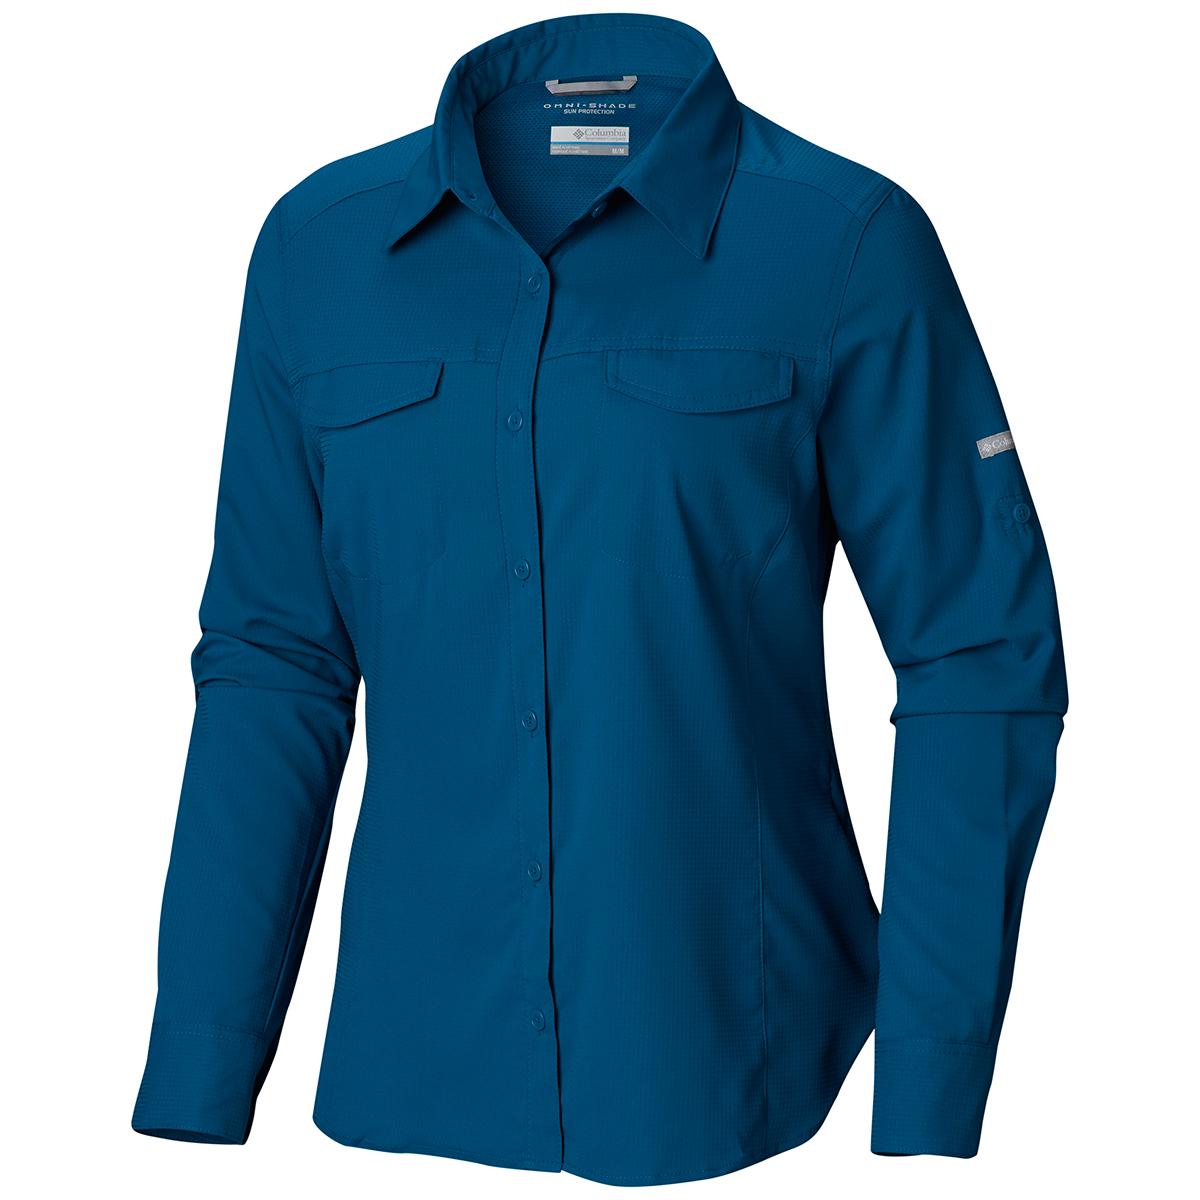 Columbia Women's Silver Ridge Lite Long-Sleeve Shirt - Green, XL